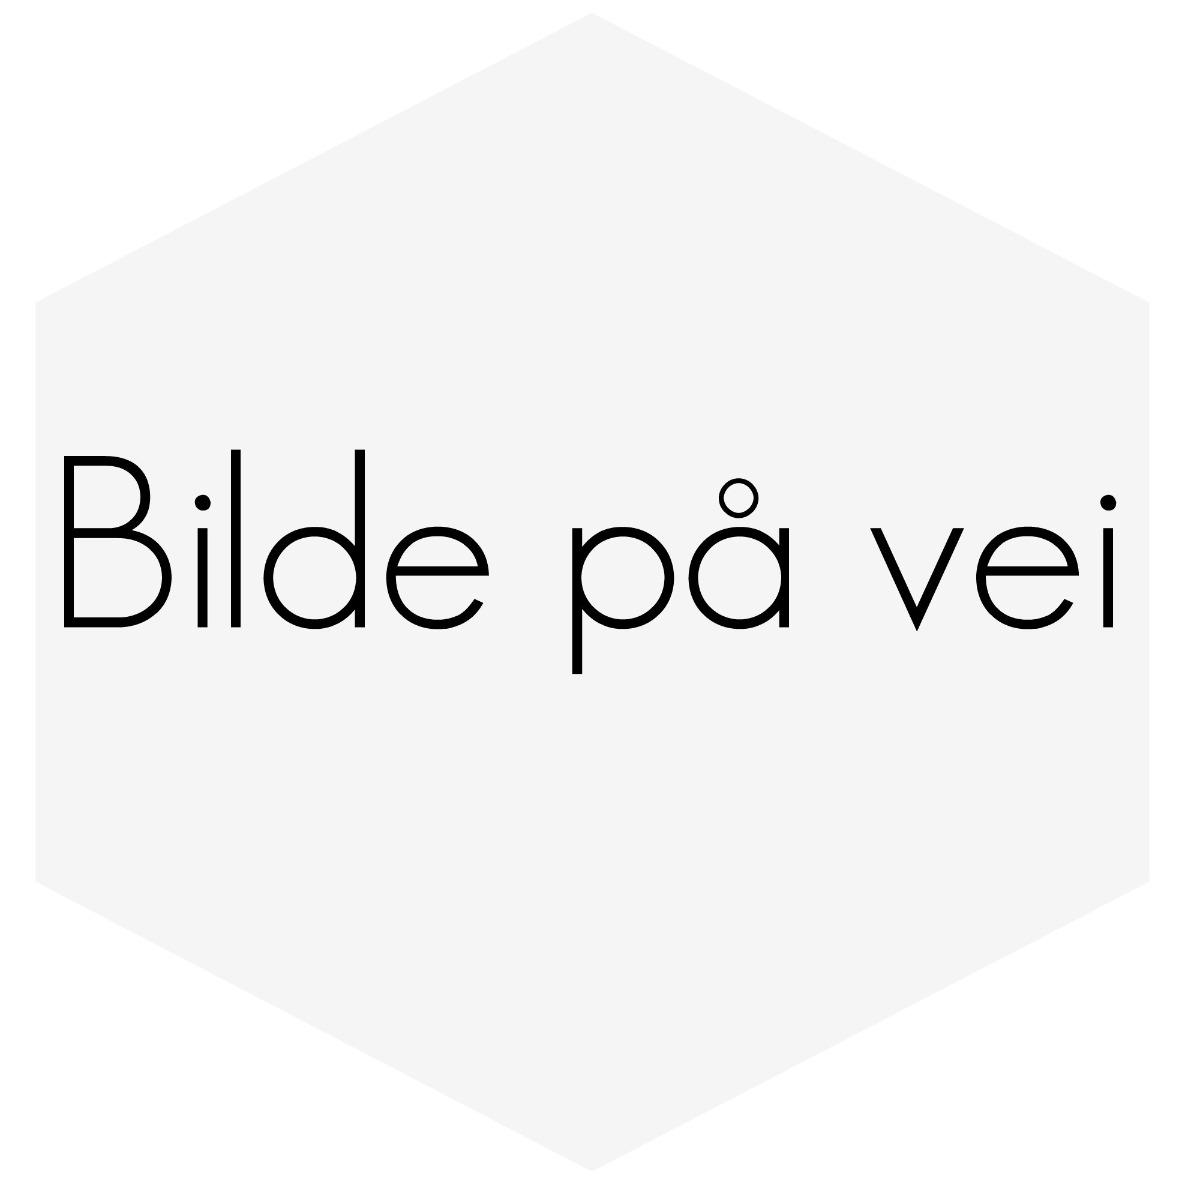 STØTDEMPER BAK 240-260 75-93 MOD  RIMELIG GASS TYPE1206641